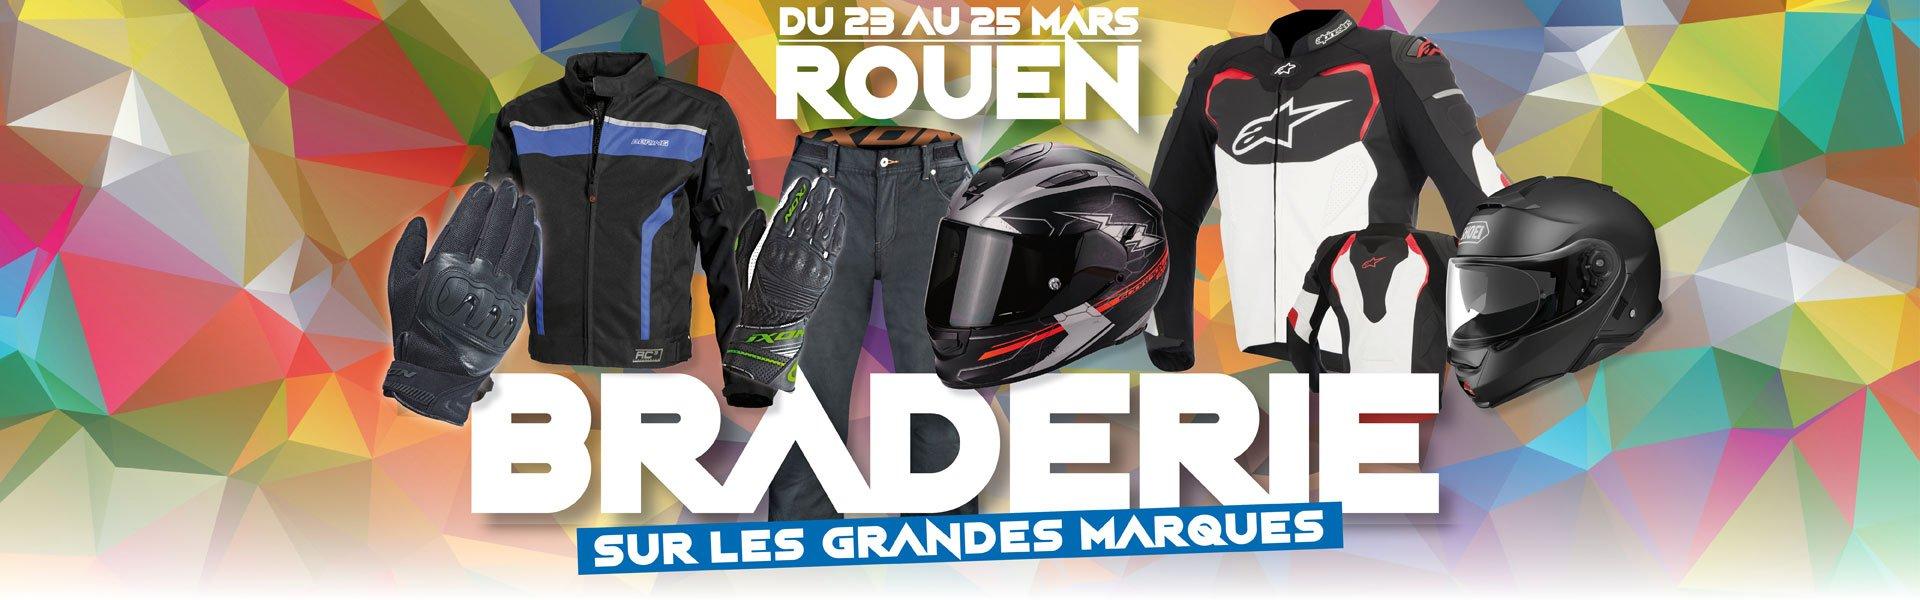 Braderie Cardy Rouen 2018